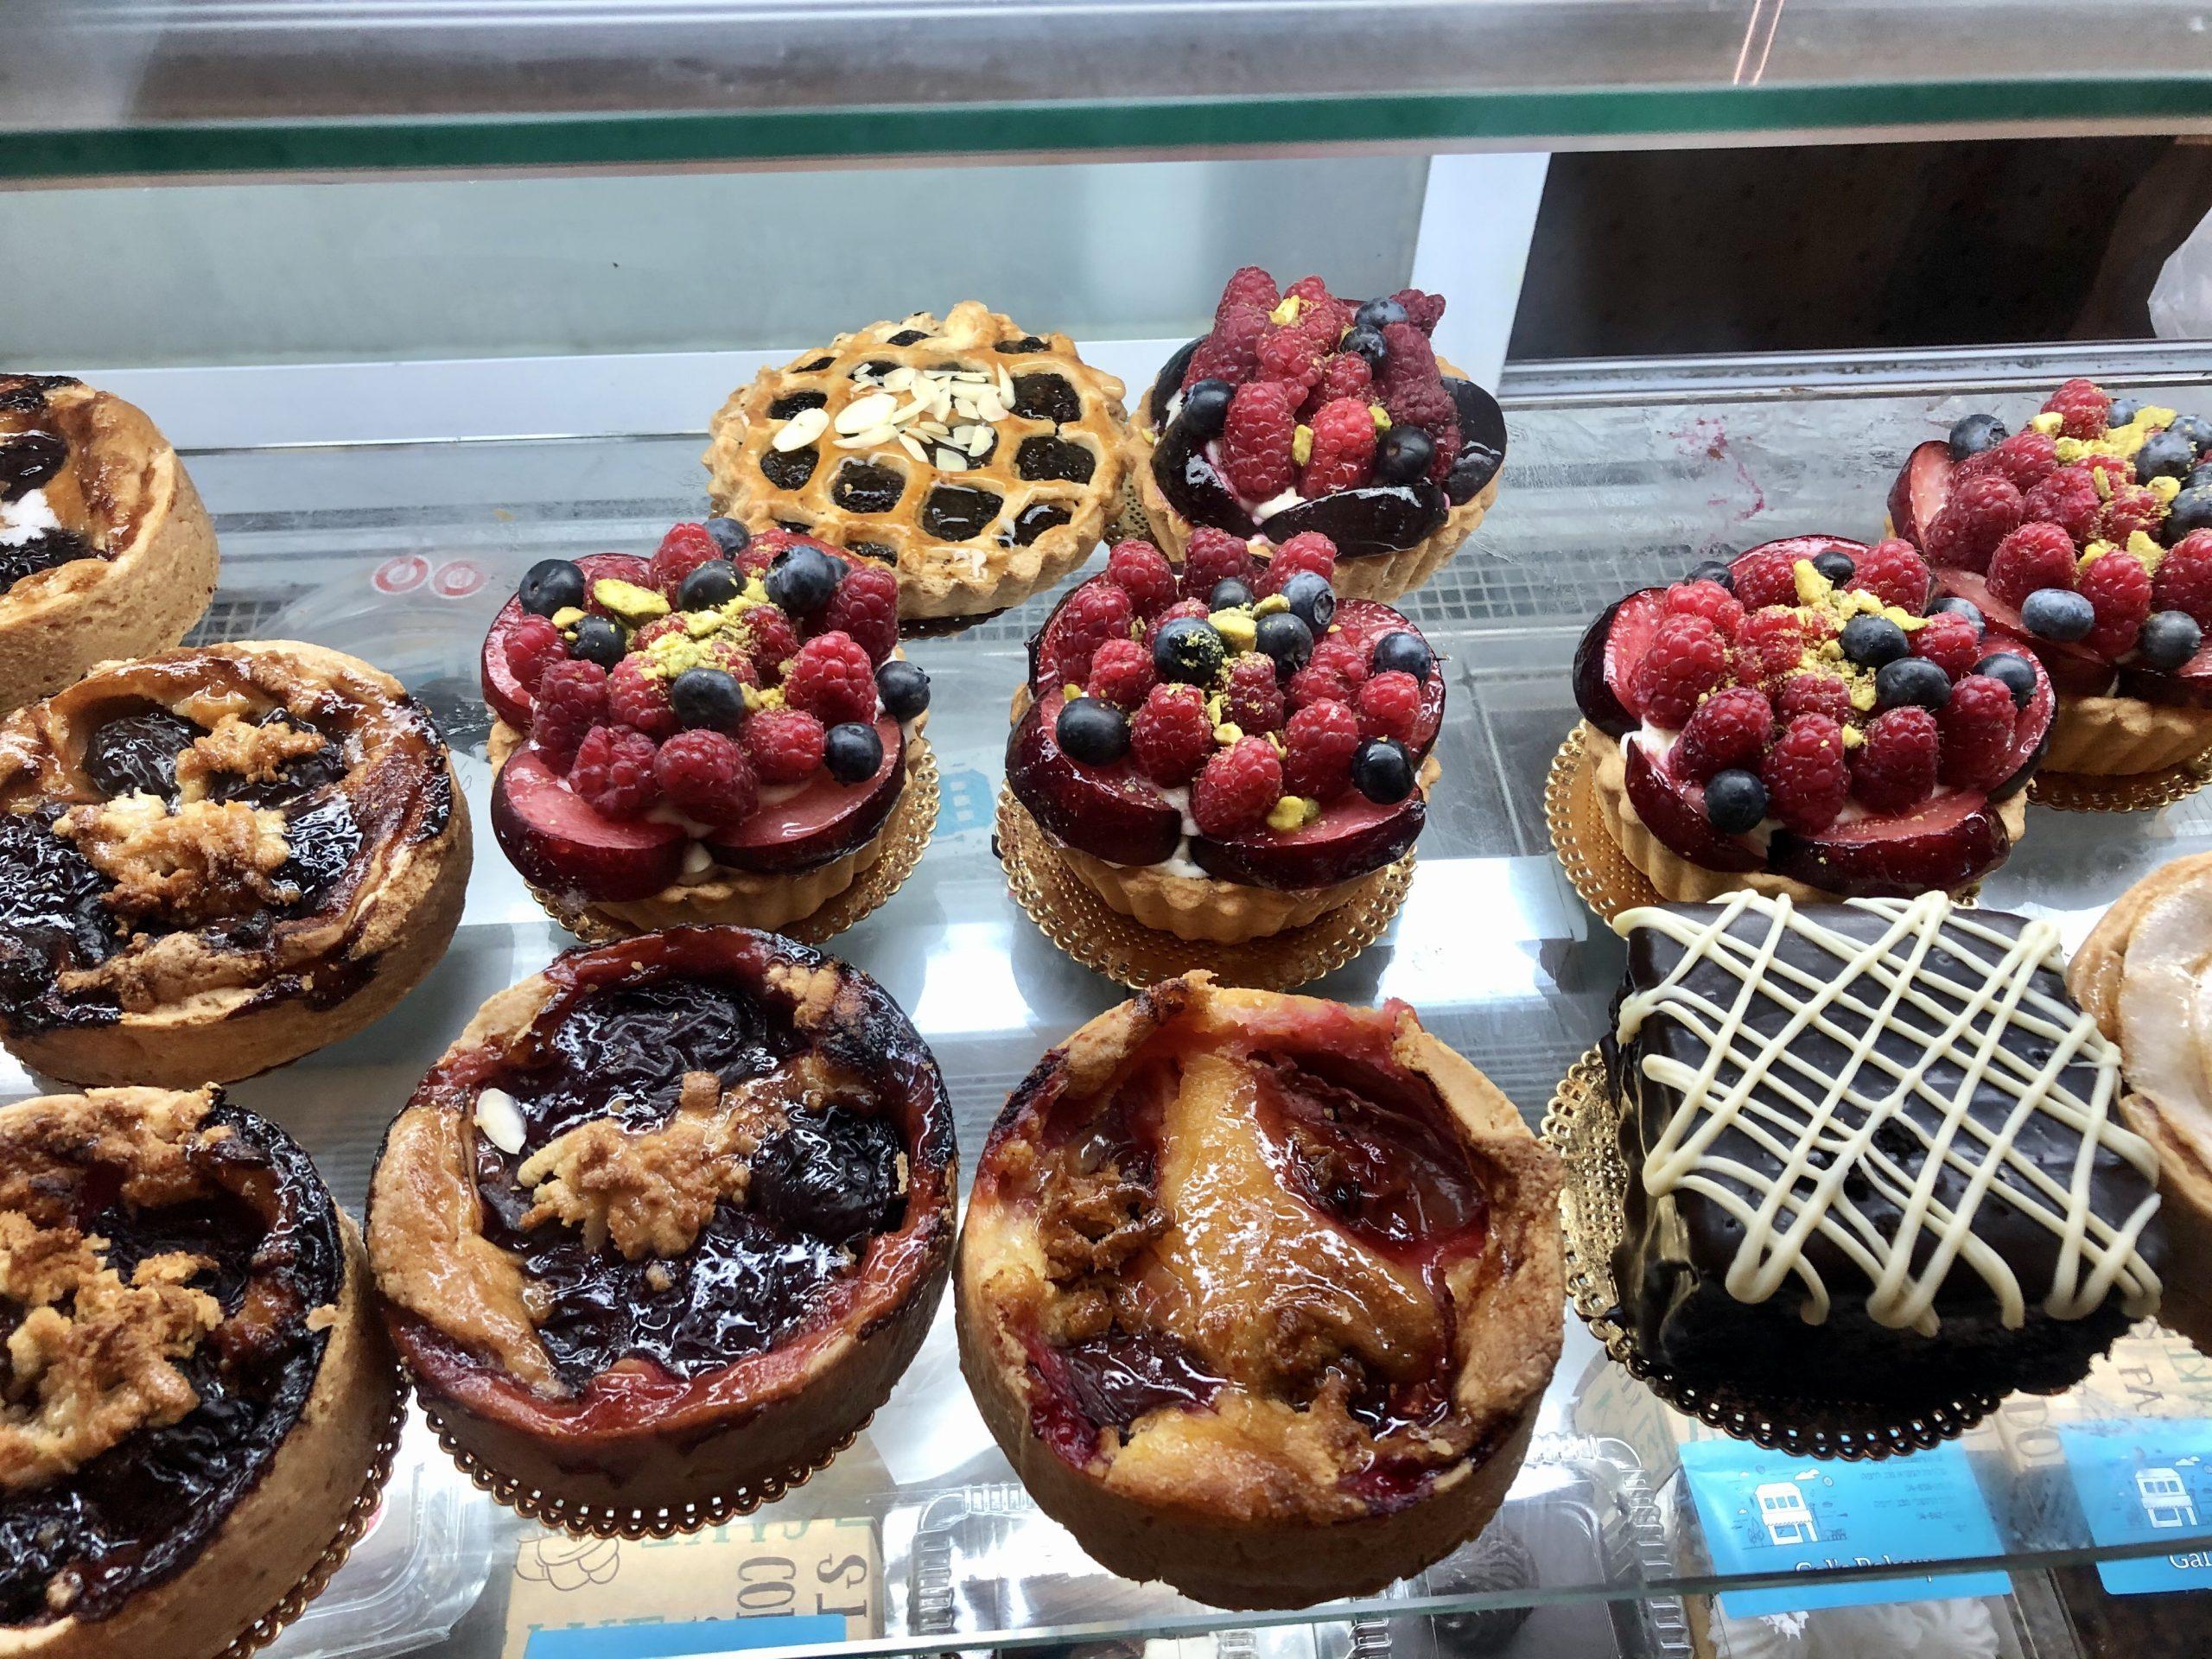 Desserts in Gal Bakery, Haifa